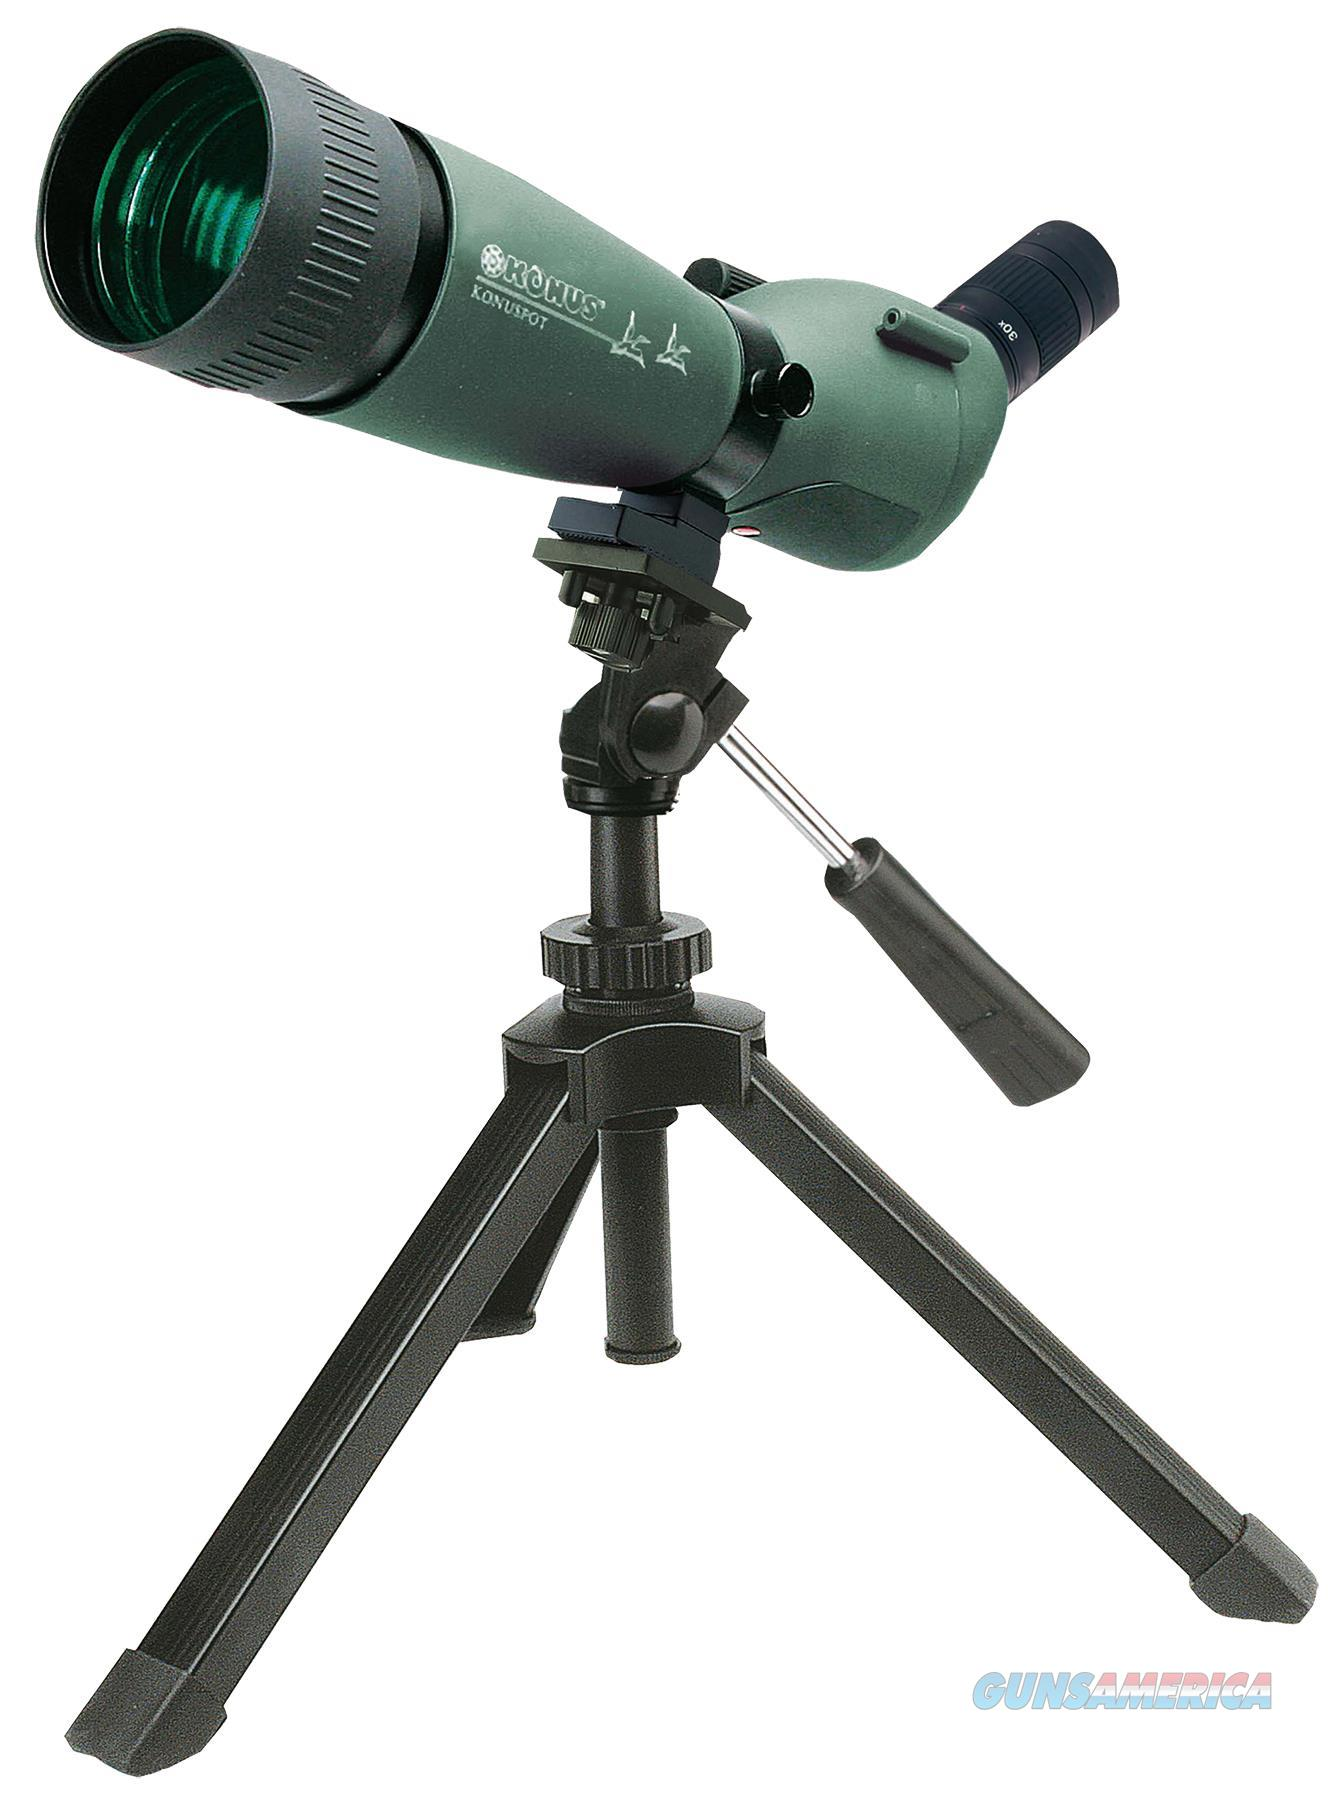 Konus 7120B Konuspot 20-60X 80Mm 79-41 Ft @ 1000 Yds Fov Angled Green W/Tripod, Photo Adapter, Case 7120  Non-Guns > Scopes/Mounts/Rings & Optics > Mounts > Other